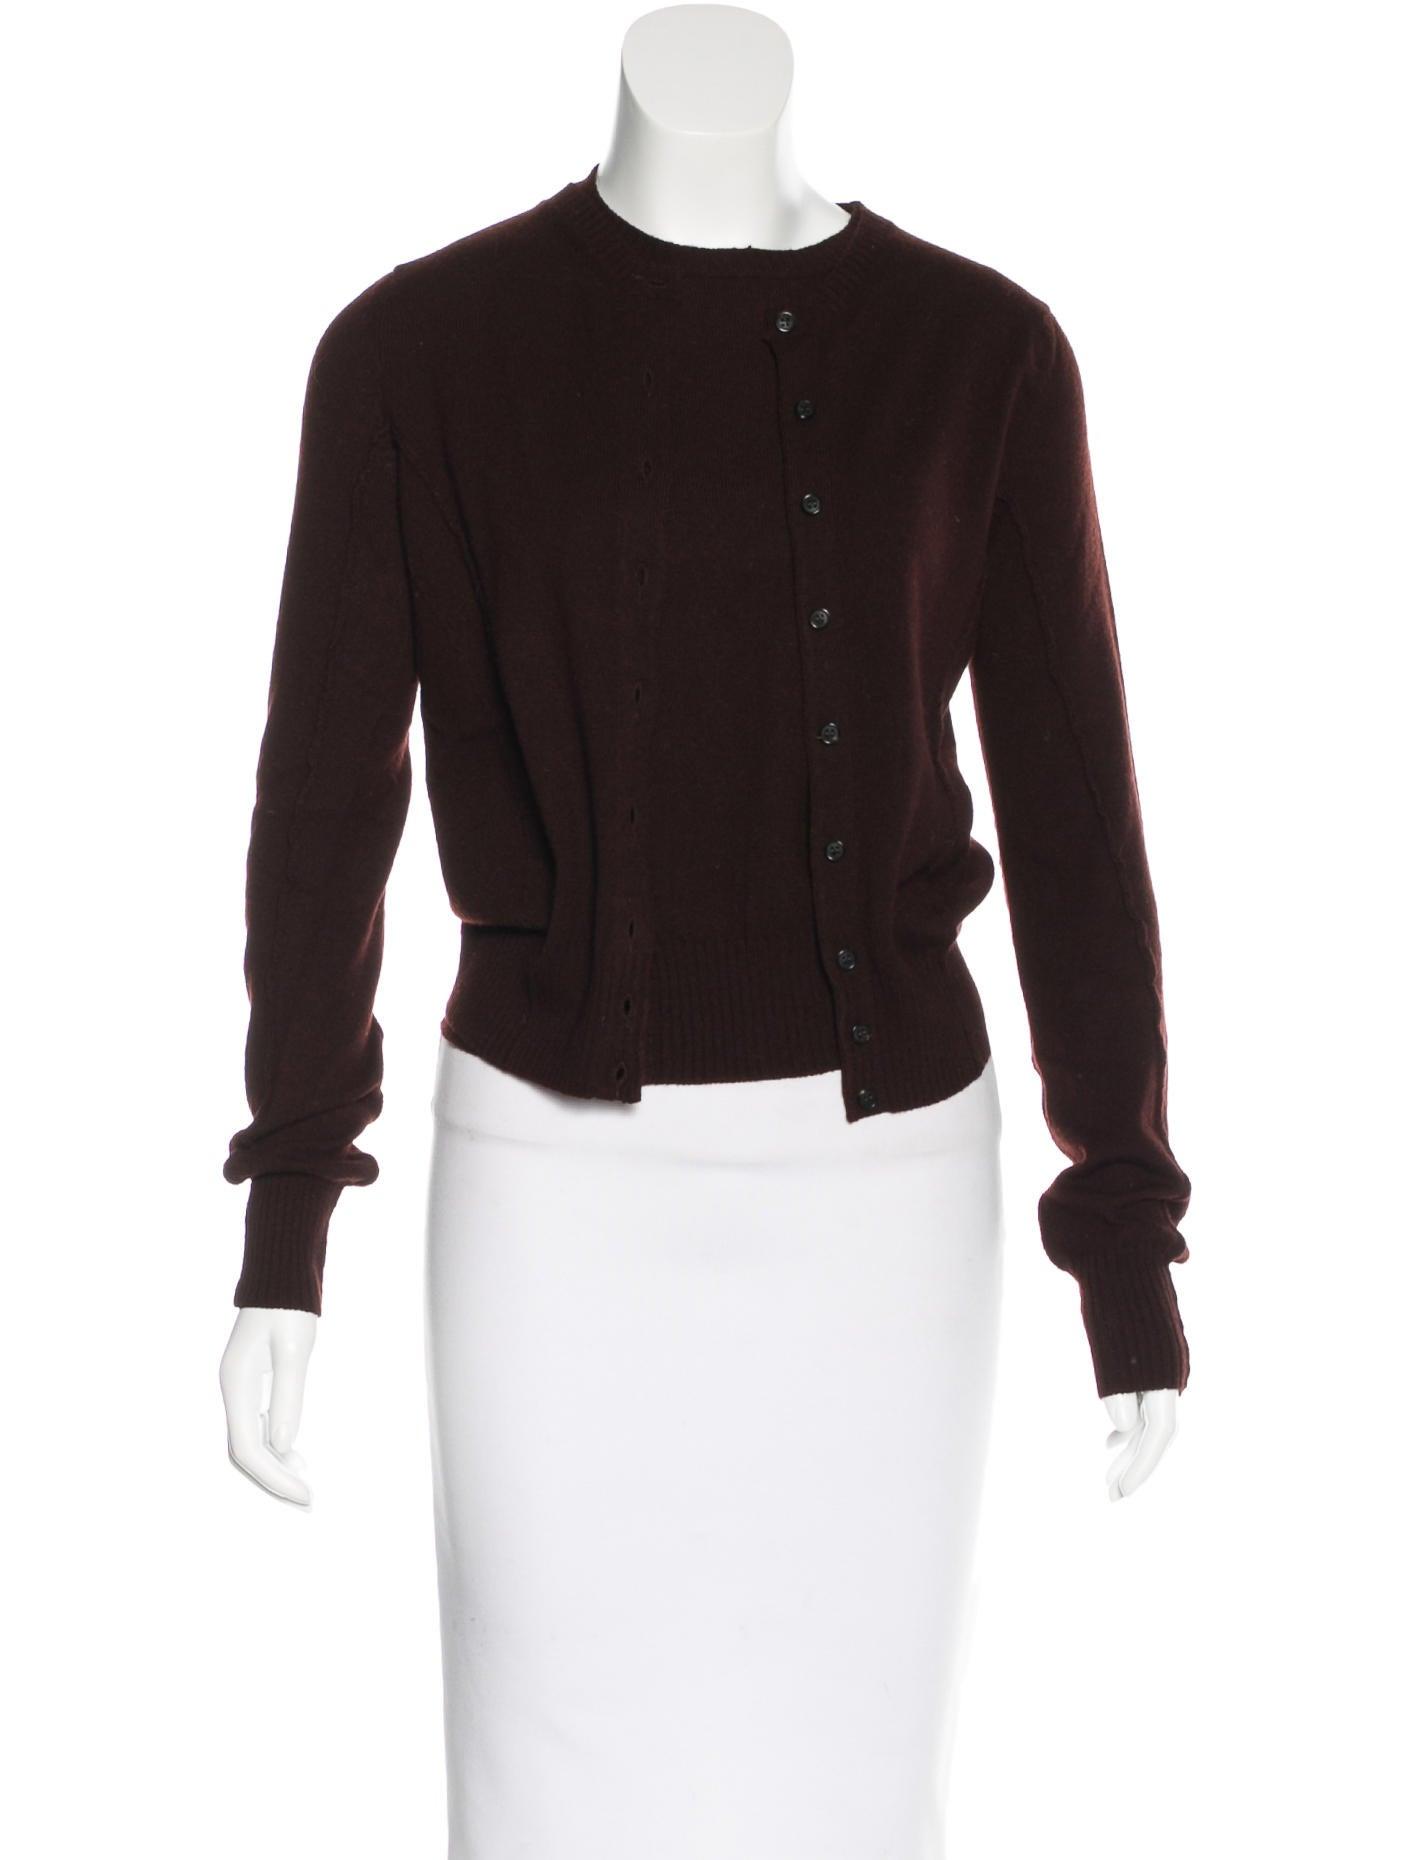 calvin klein collection cashmere cardigan set clothing. Black Bedroom Furniture Sets. Home Design Ideas